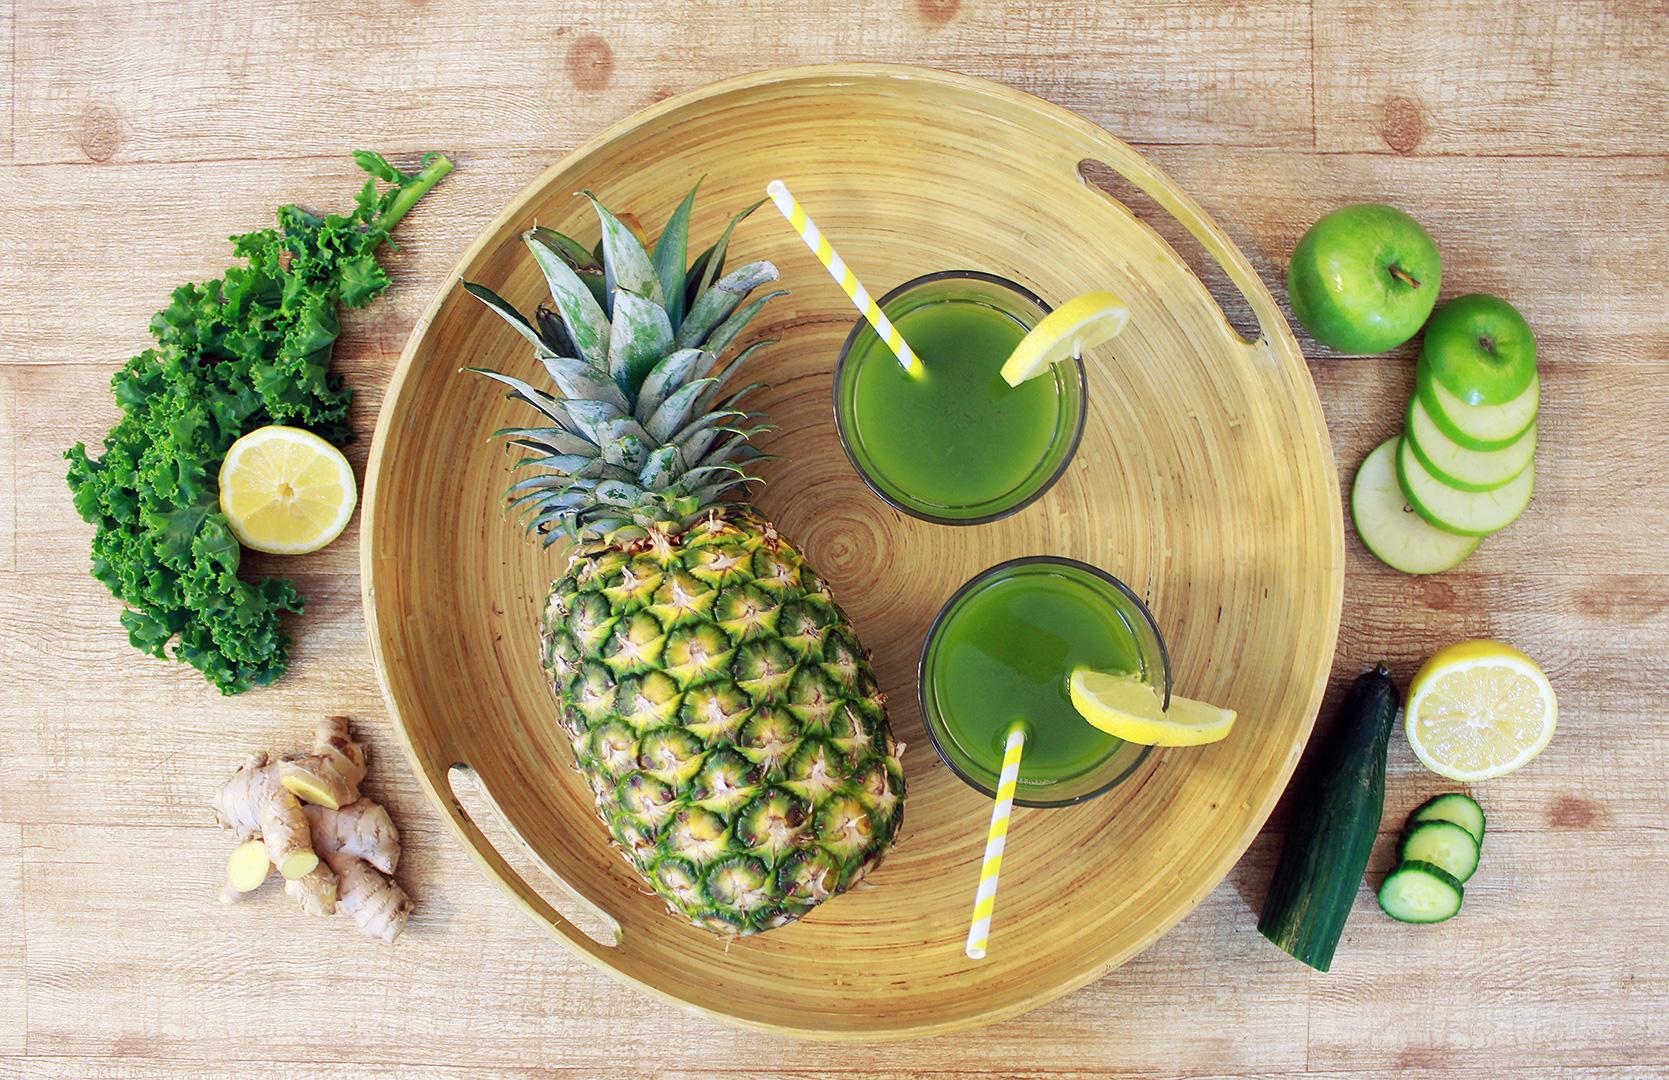 Pineapple Green Juice Ingredients: Pineapple, Kale, Cucumber, Green Apple, Lemon, Ginger